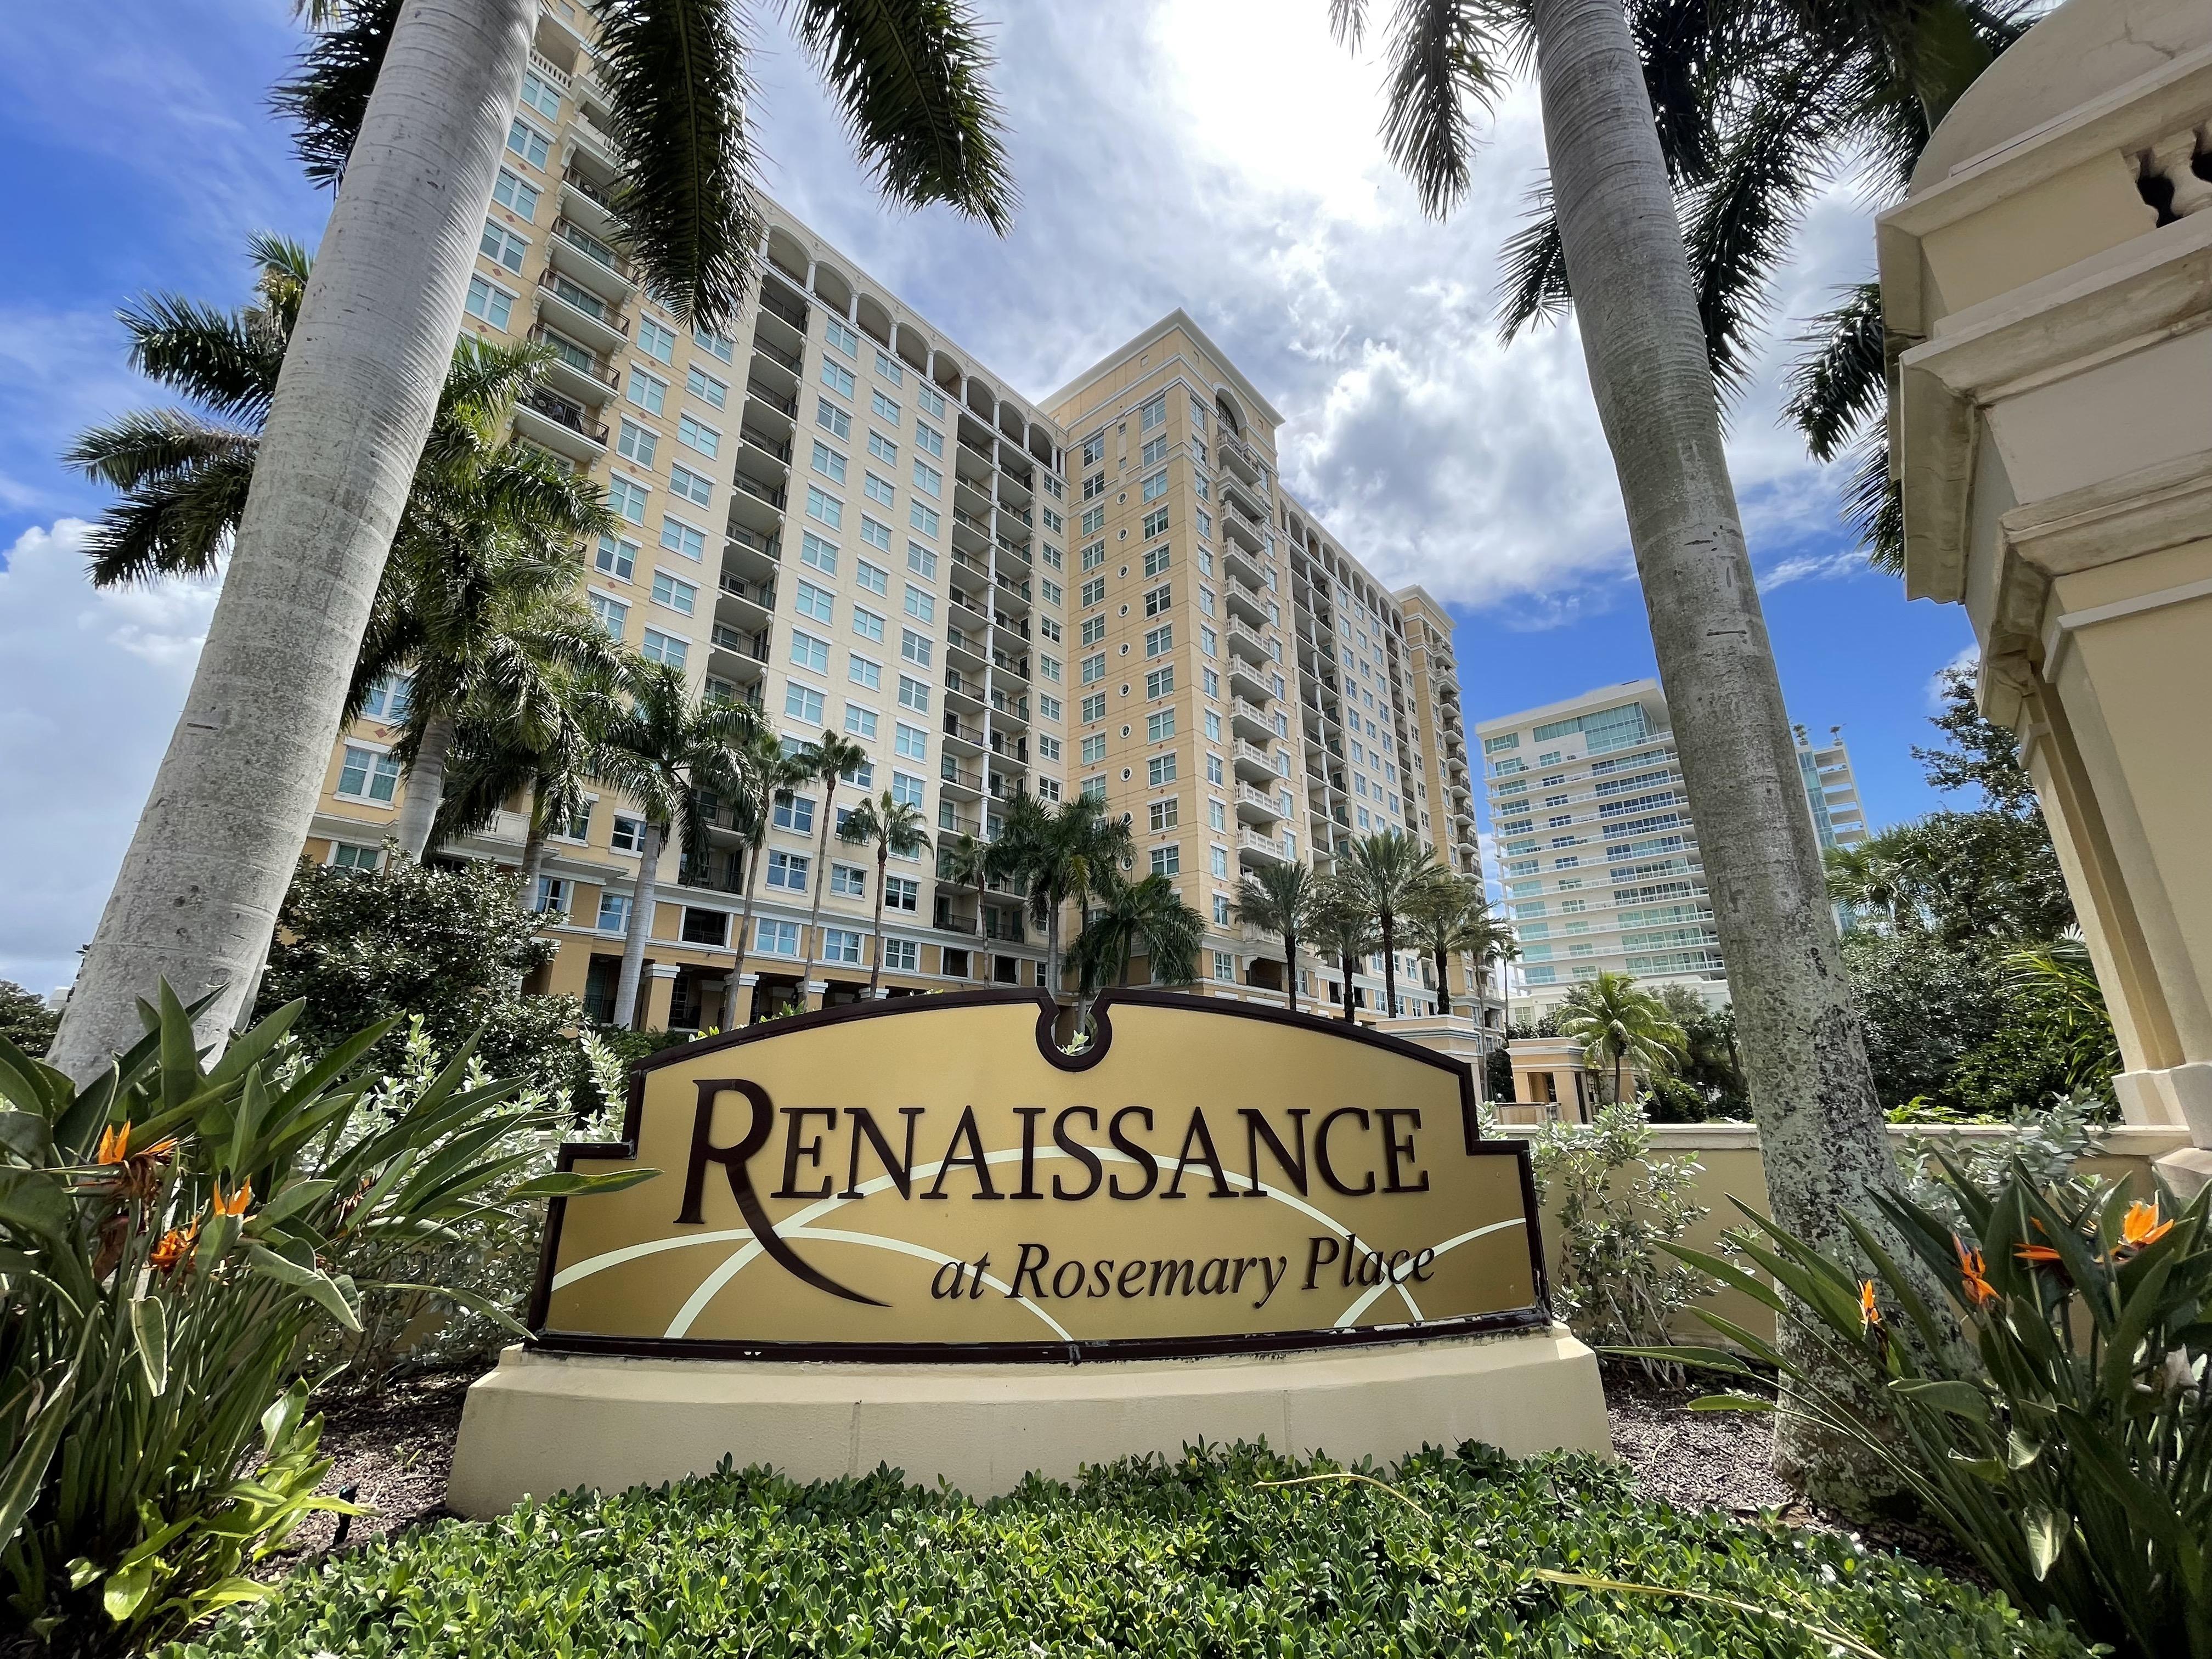 Renaissance at Rosemary Place